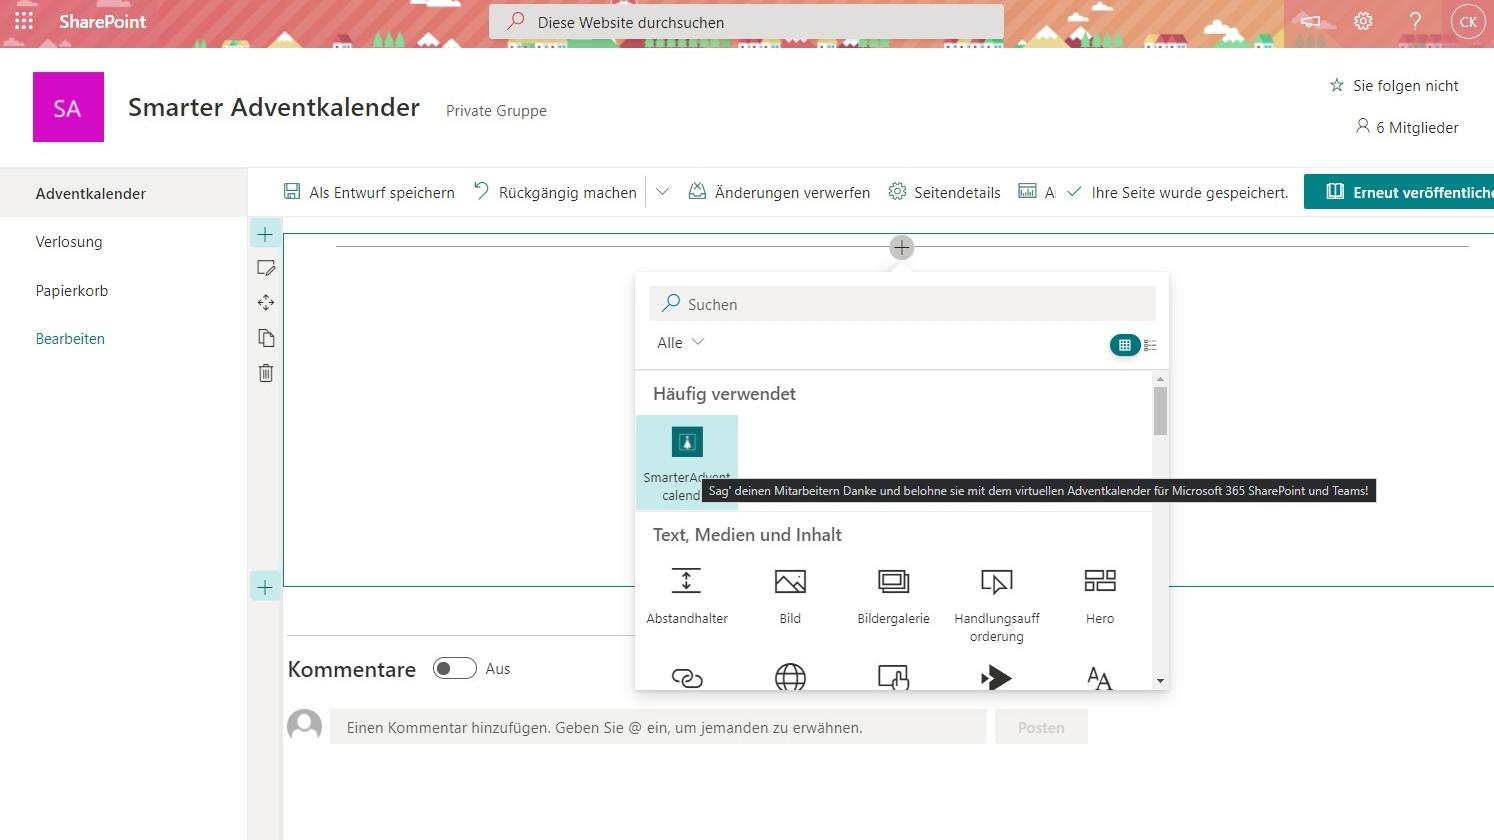 Smarter Adventkalender - Webpart hinzufügen